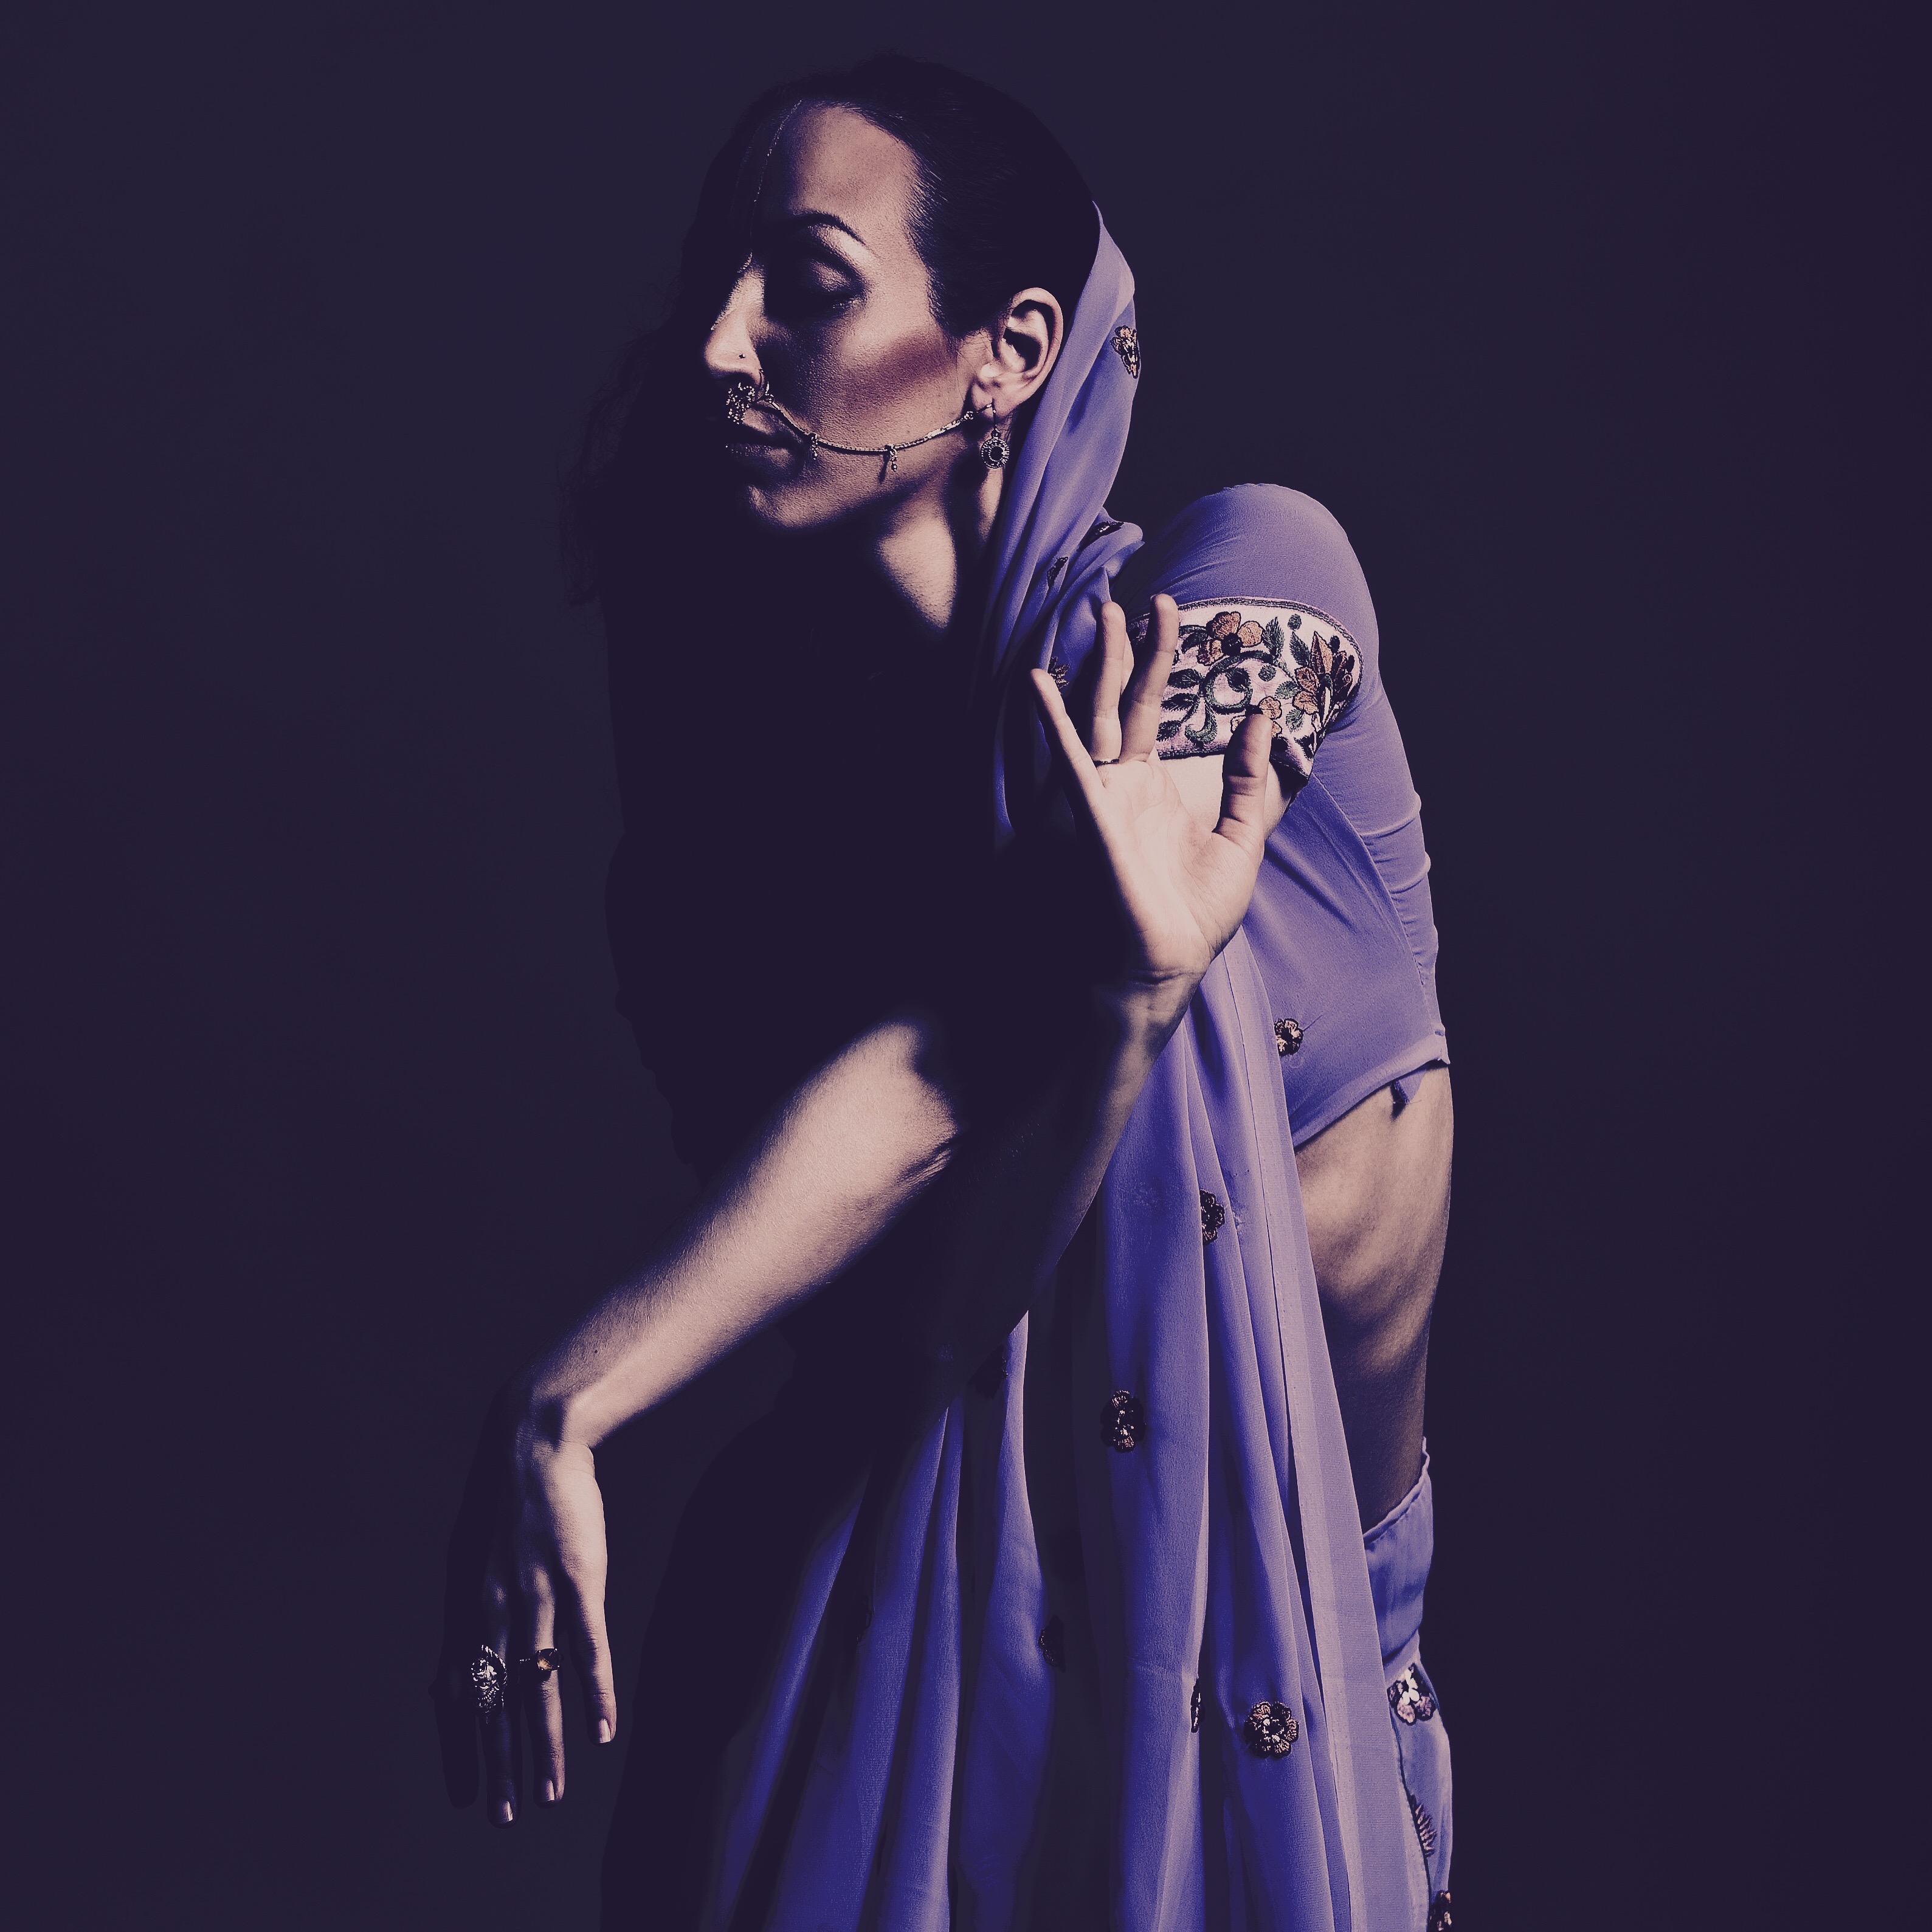 Vraja Sundari Keilman - Photo by Karen Scheffers